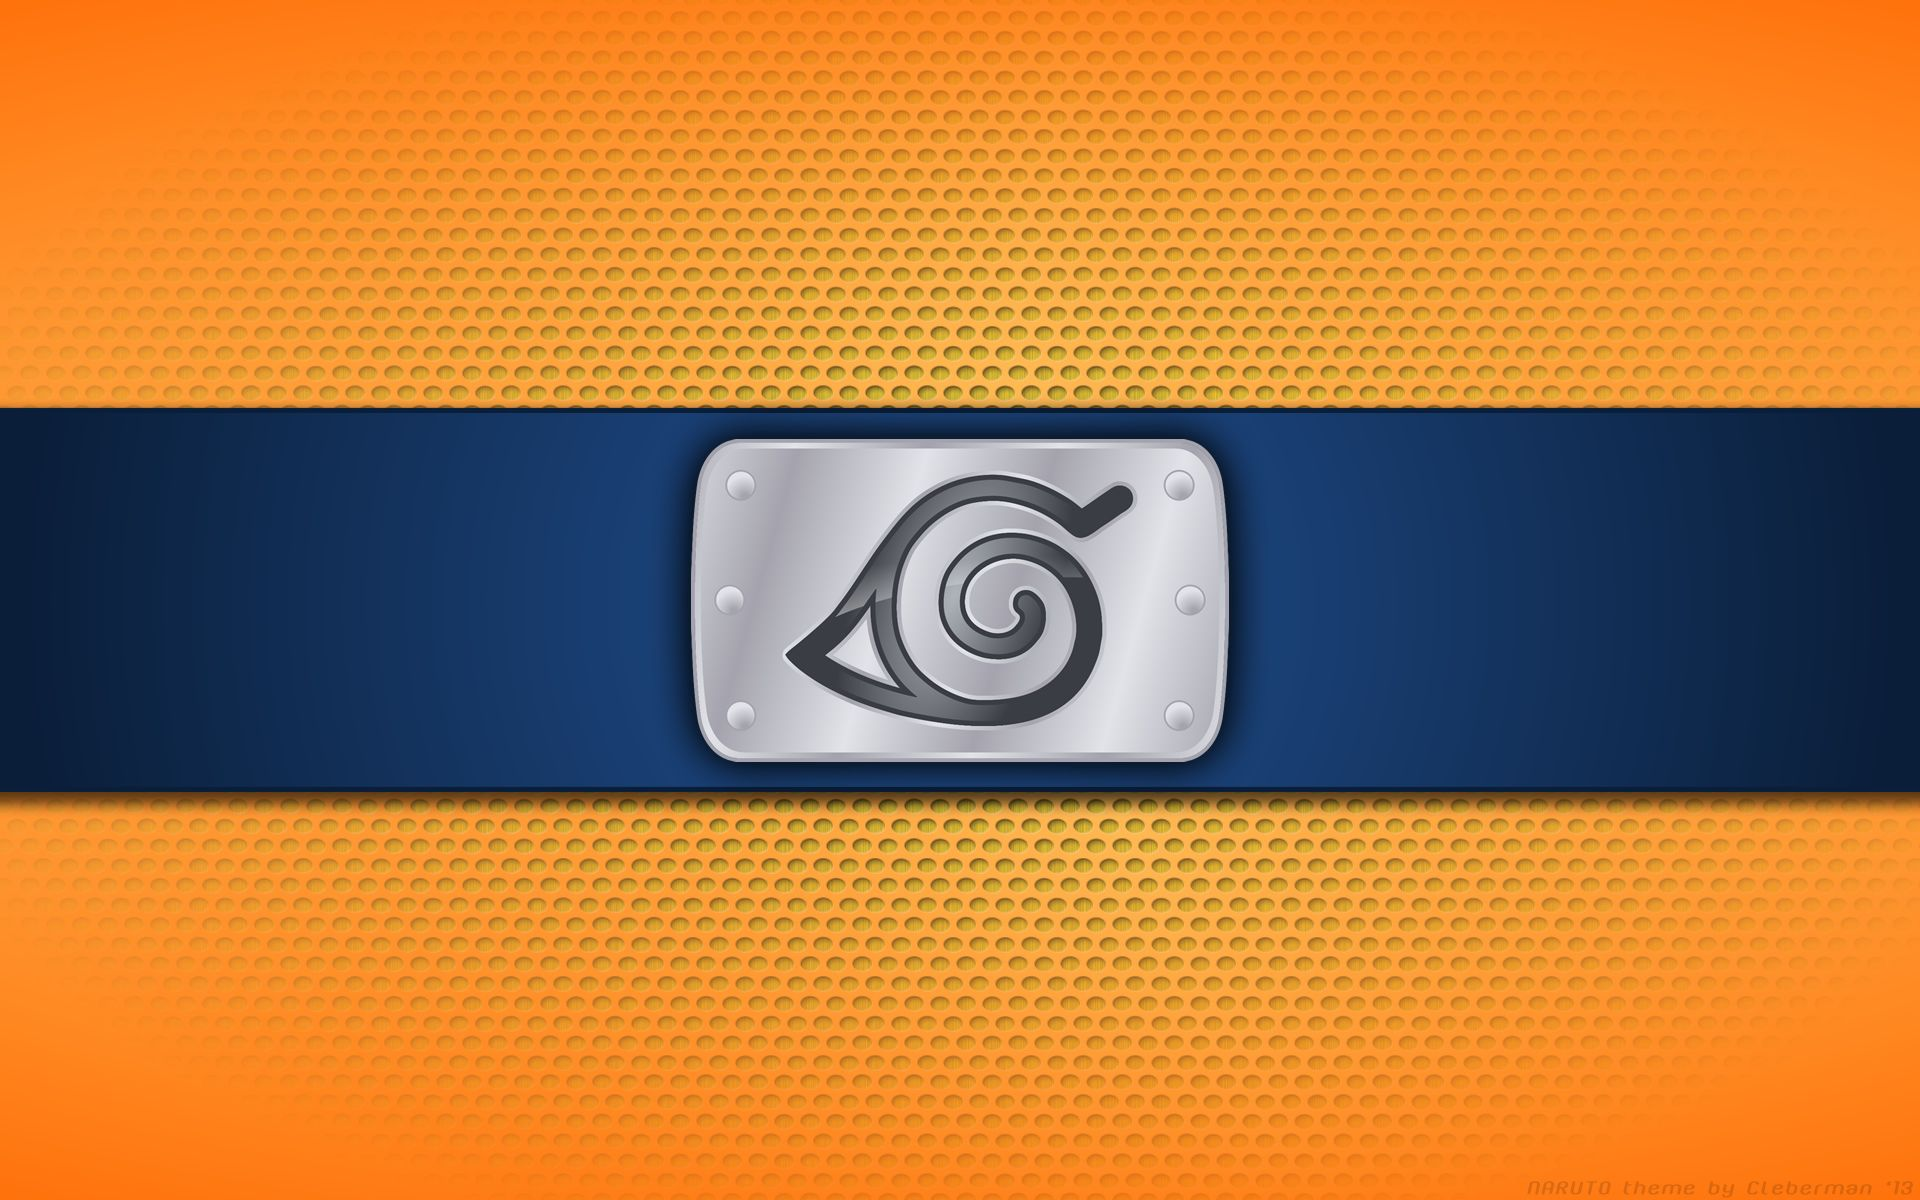 Google chrome theme itachi - Naruto Theme Wallpaper Backgrounds Wallpapers Classic Logo Anime Php